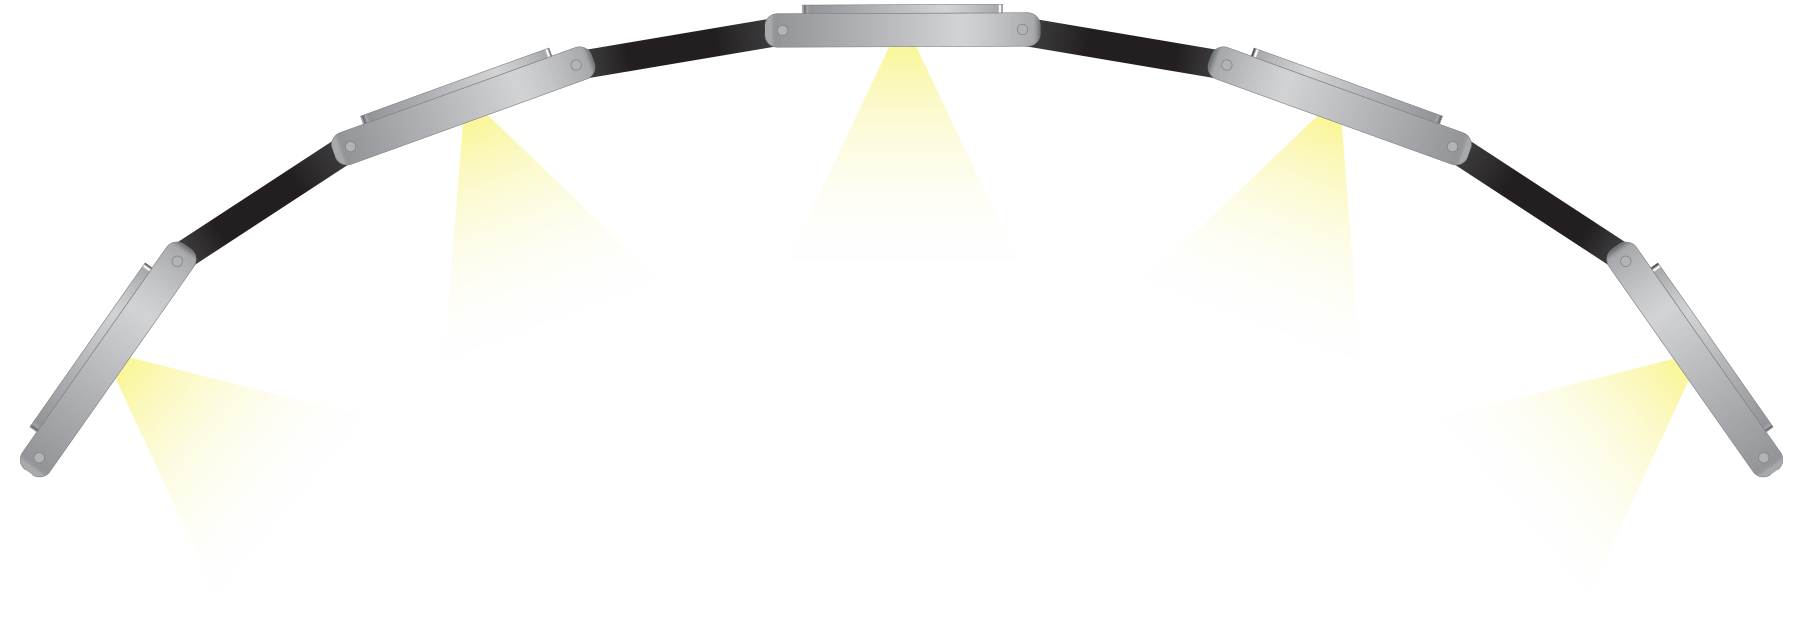 V-PIX Shape 3